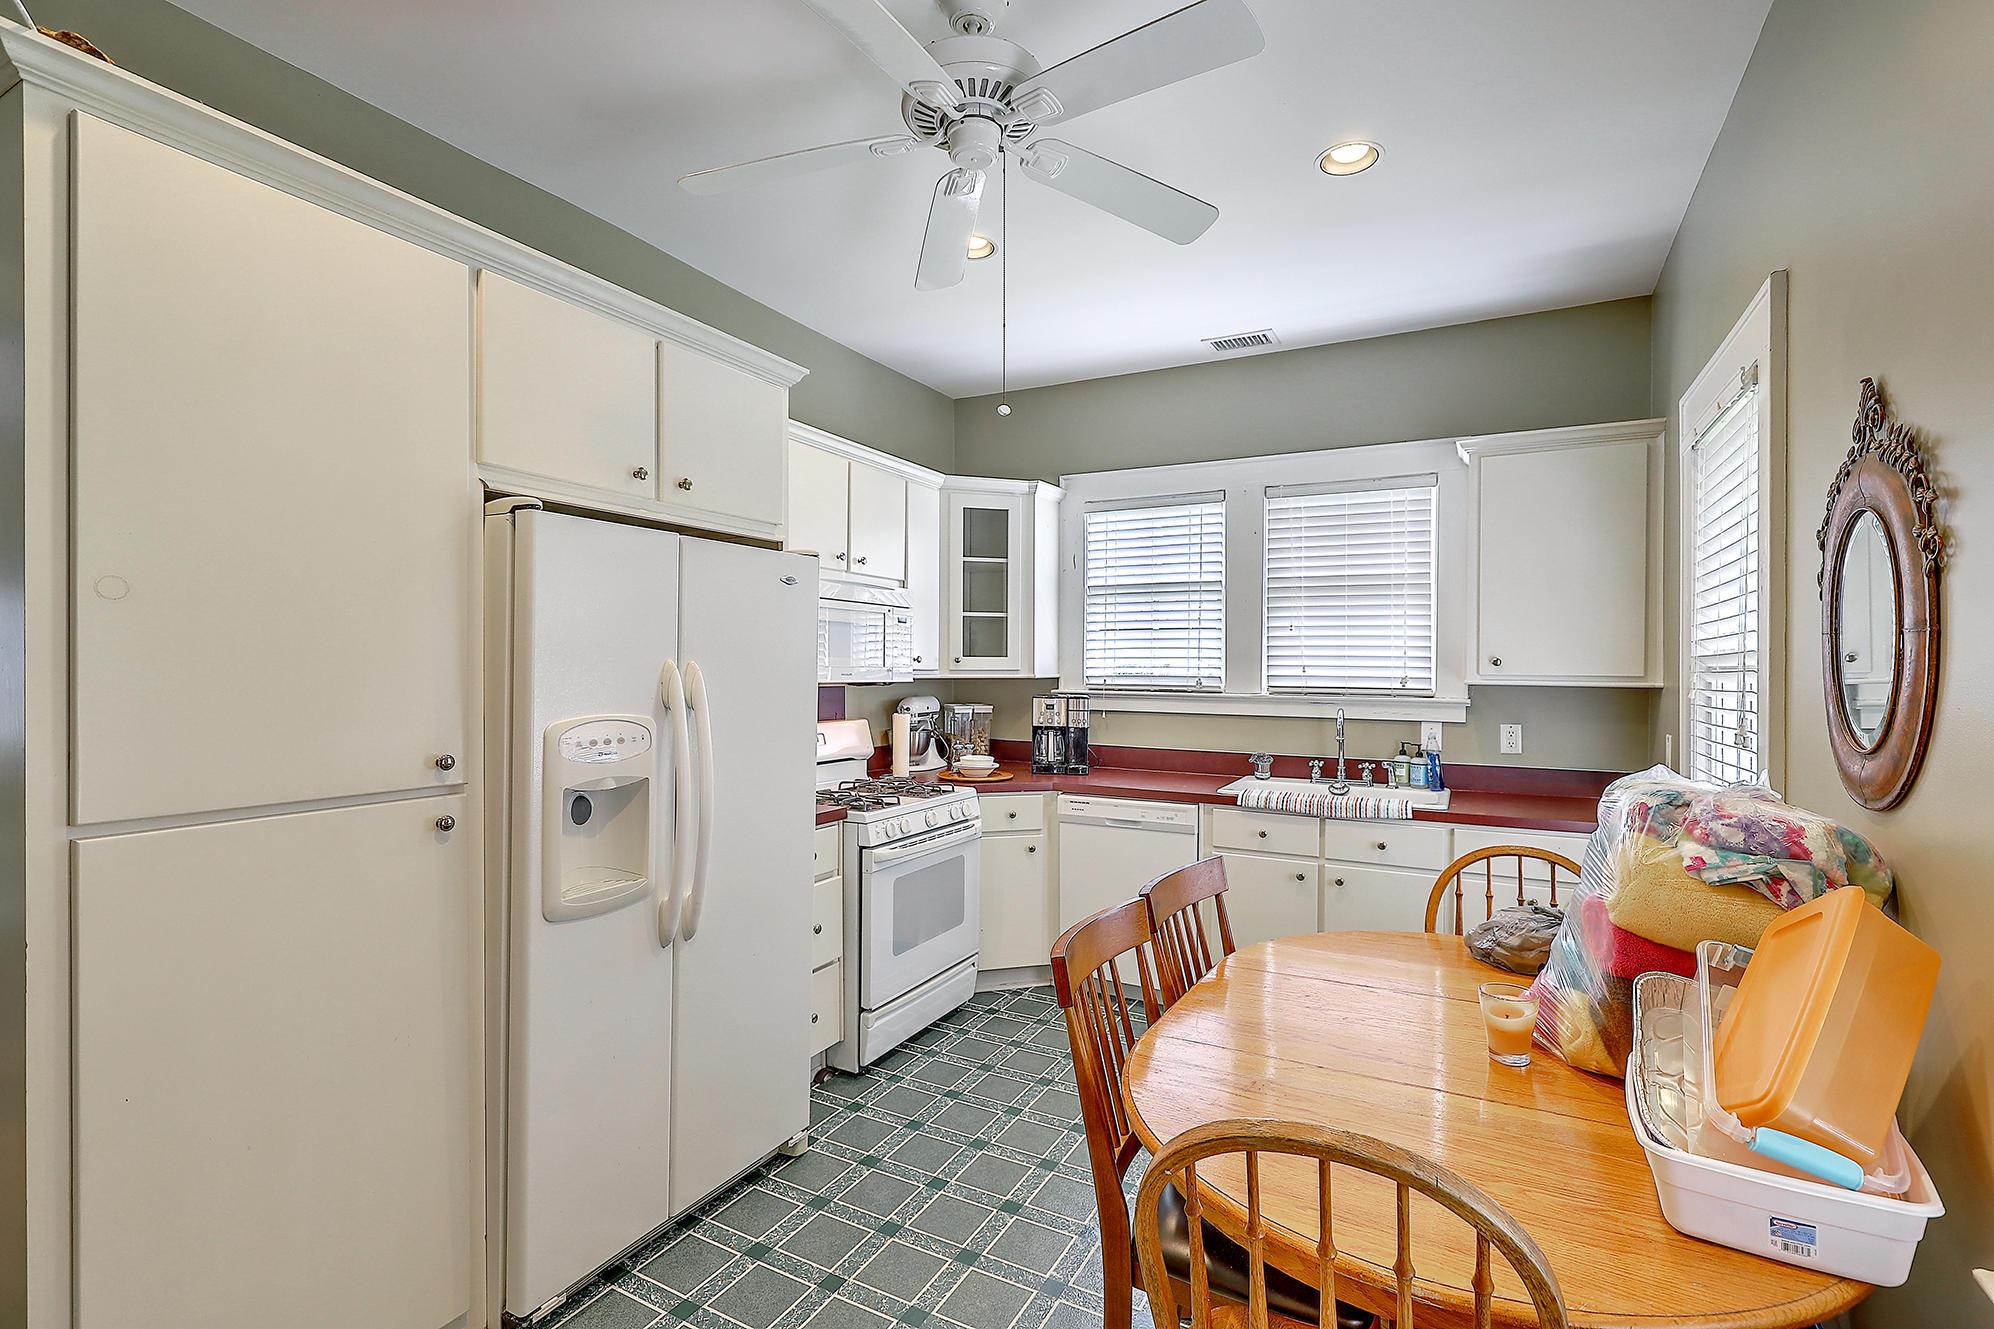 Summerville Homes For Sale - 102 Hickory, Summerville, SC - 2